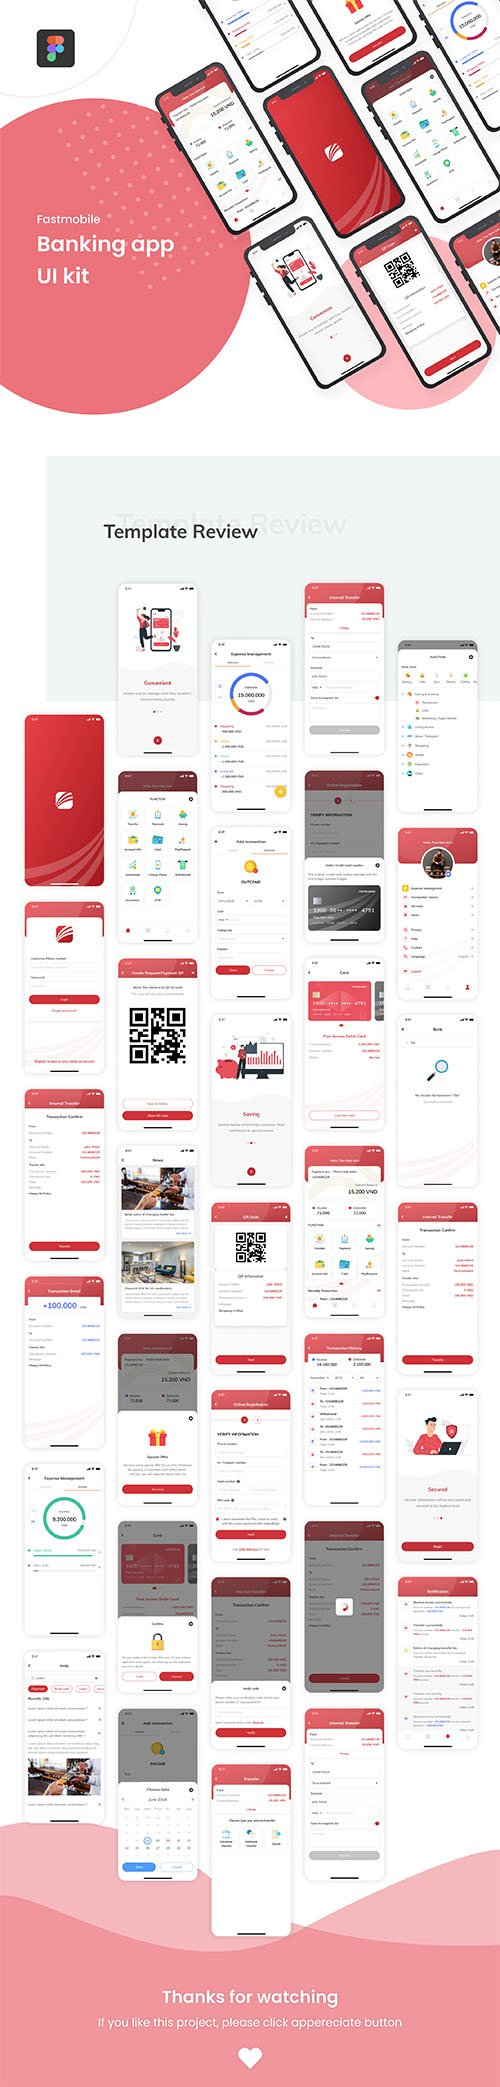 FastMobile - Banking app UI kit